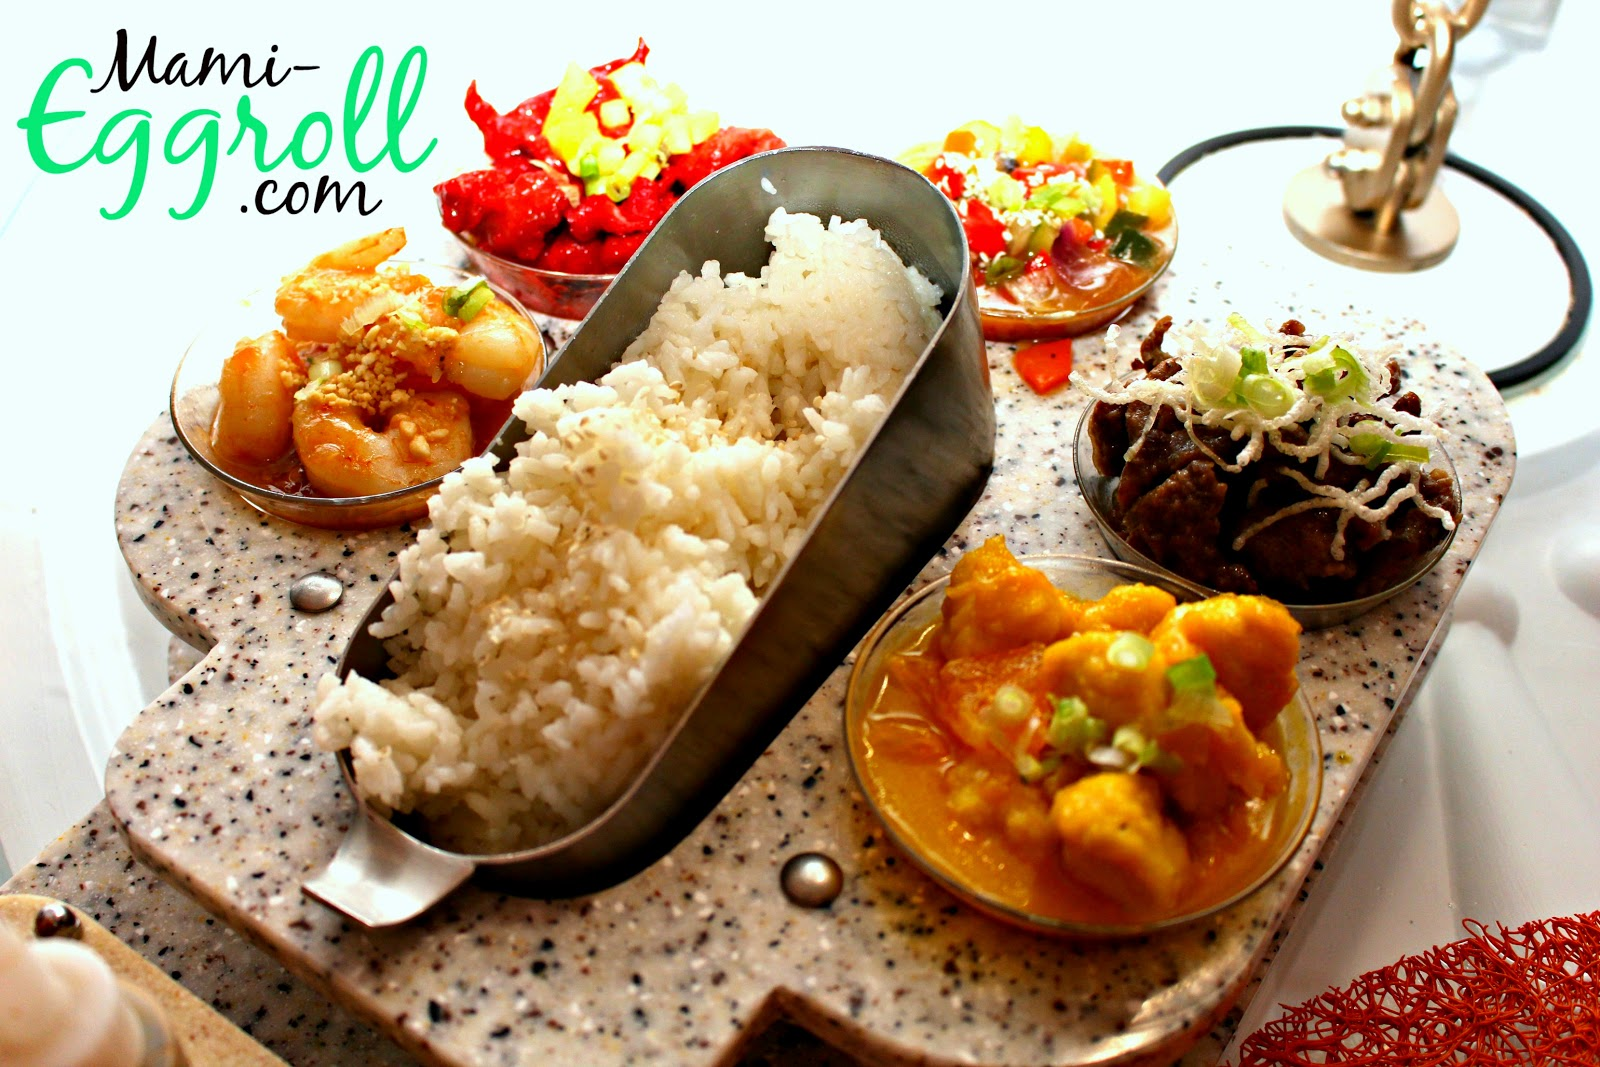 SPECIALTY DINING - Royal Caribbean International